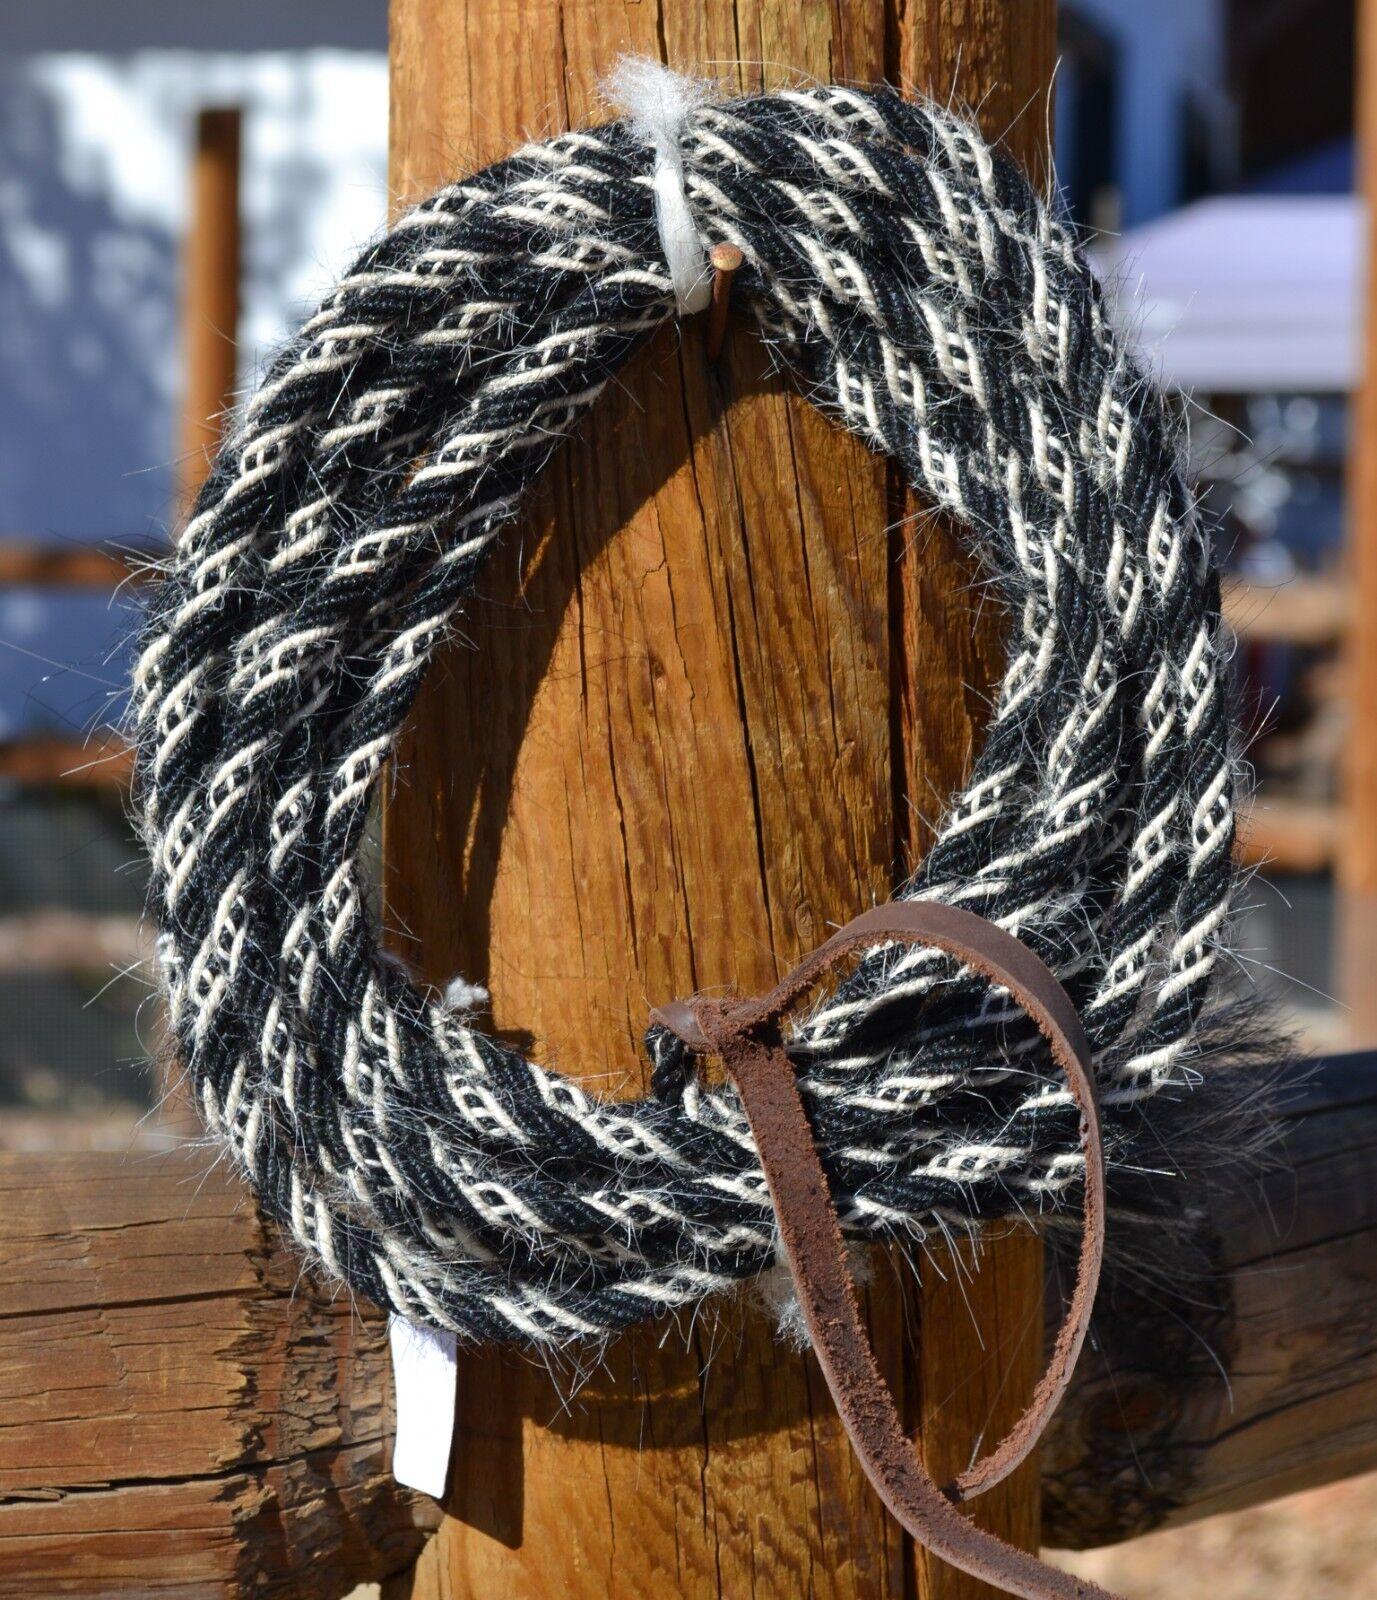 Jose Ortiz 0.6cm Angora Mohair Mecate Cuerda Riñones 6.7m - blancoo y Negro